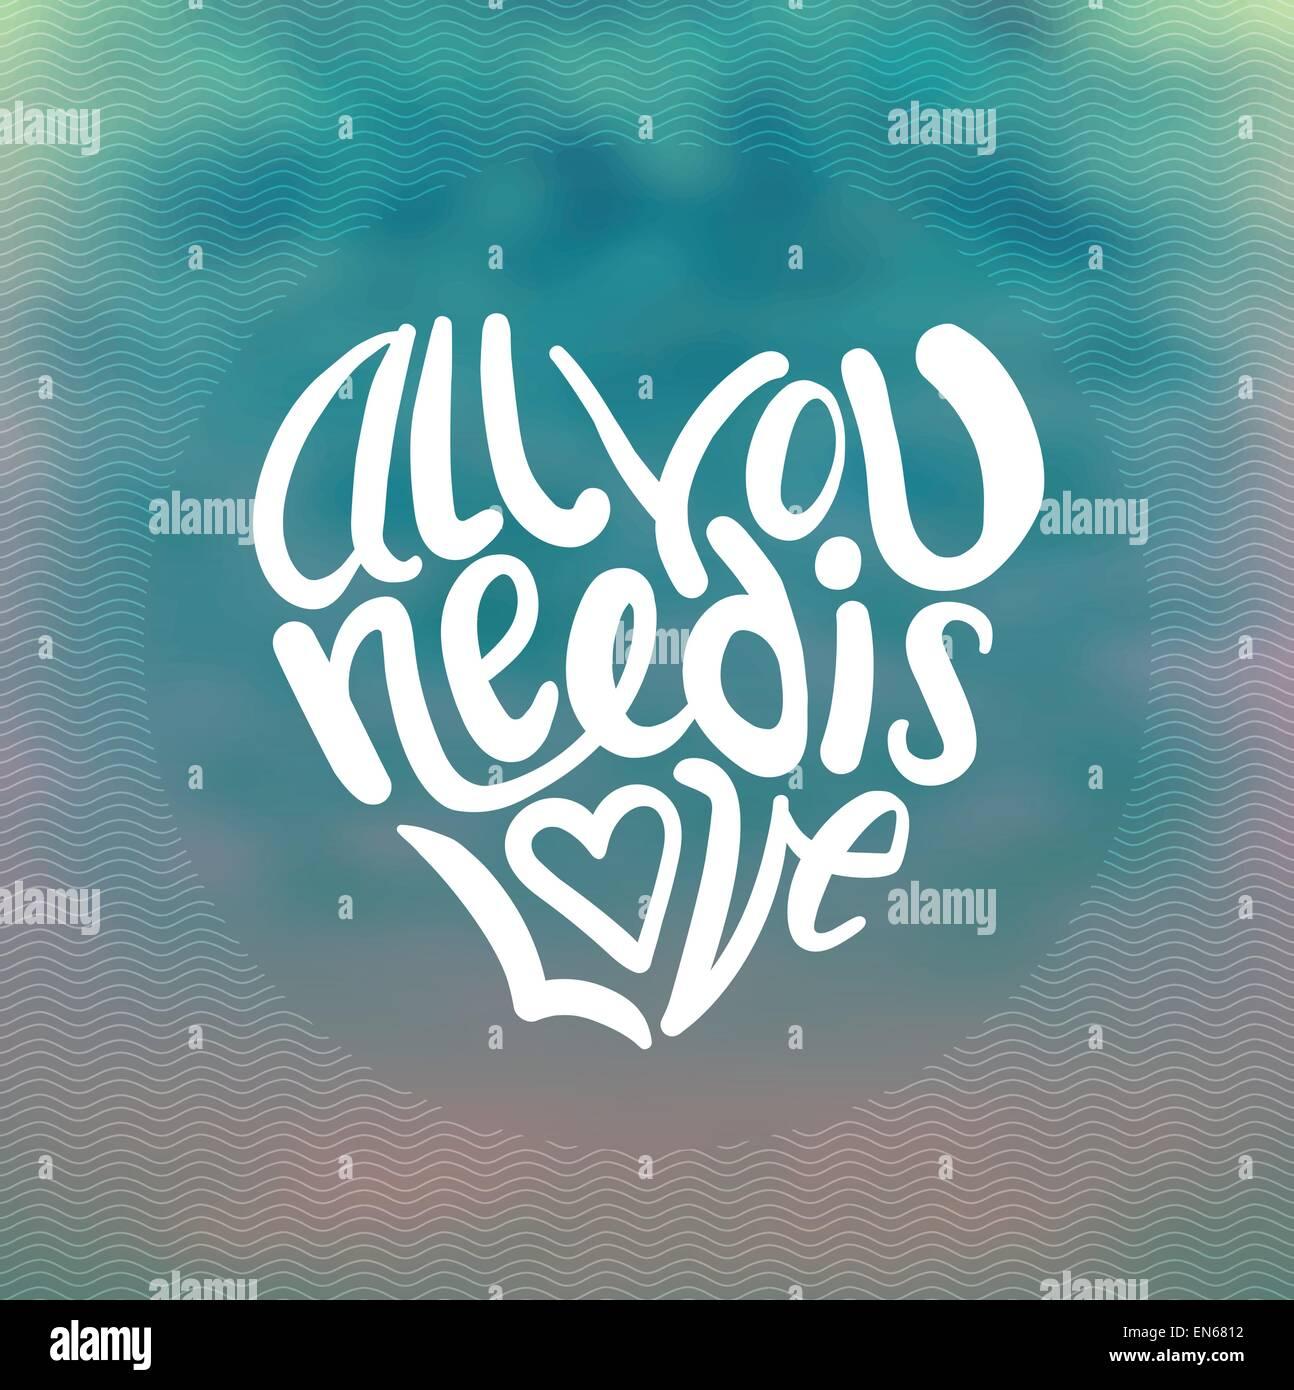 All you need is love vector Illustration de Vecteur